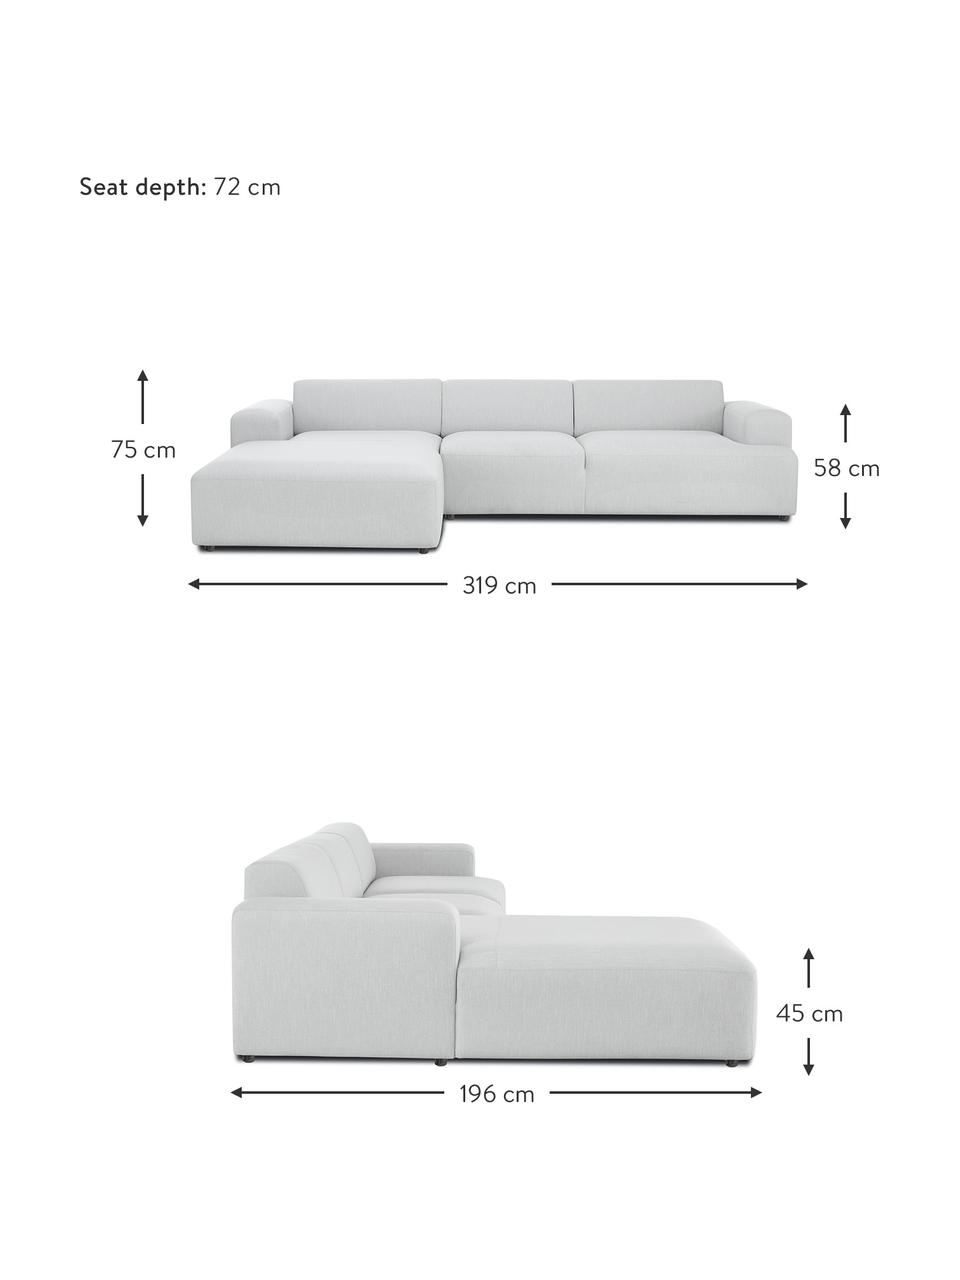 Ecksofa Melva (4-Sitzer) in Hellgrau, Bezug: 100% Polyester Der hochwe, Gestell: Massives Kiefernholz, FSC, Füße: Kunststoff, Webstoff Hellgrau, B 319 x T 196 cm